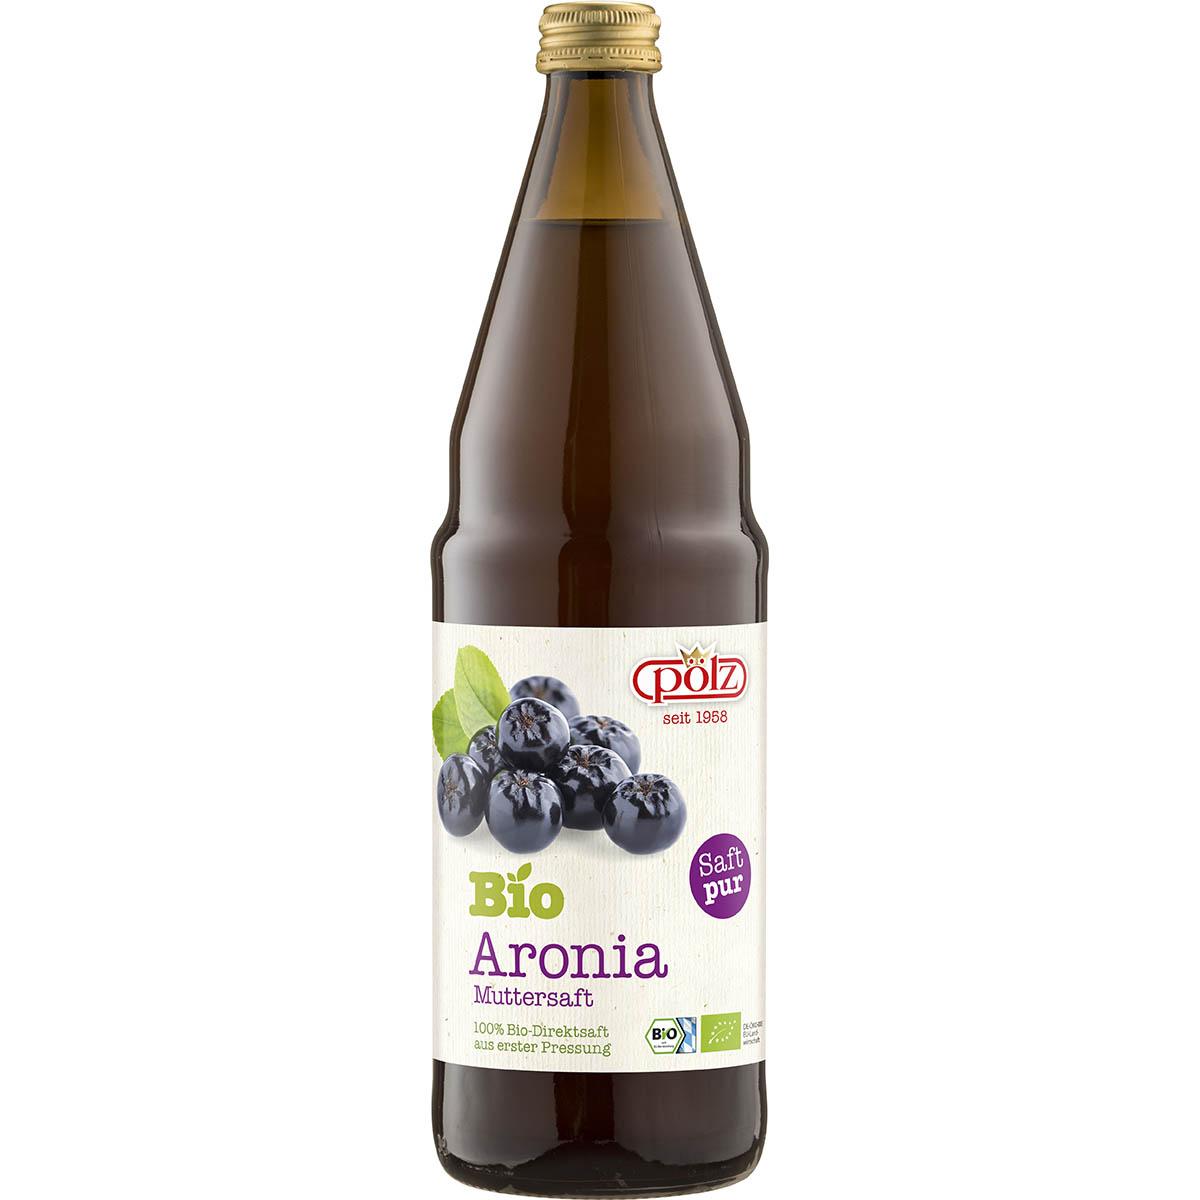 Pölz Bio Aronia Muttersaft 0,75 l